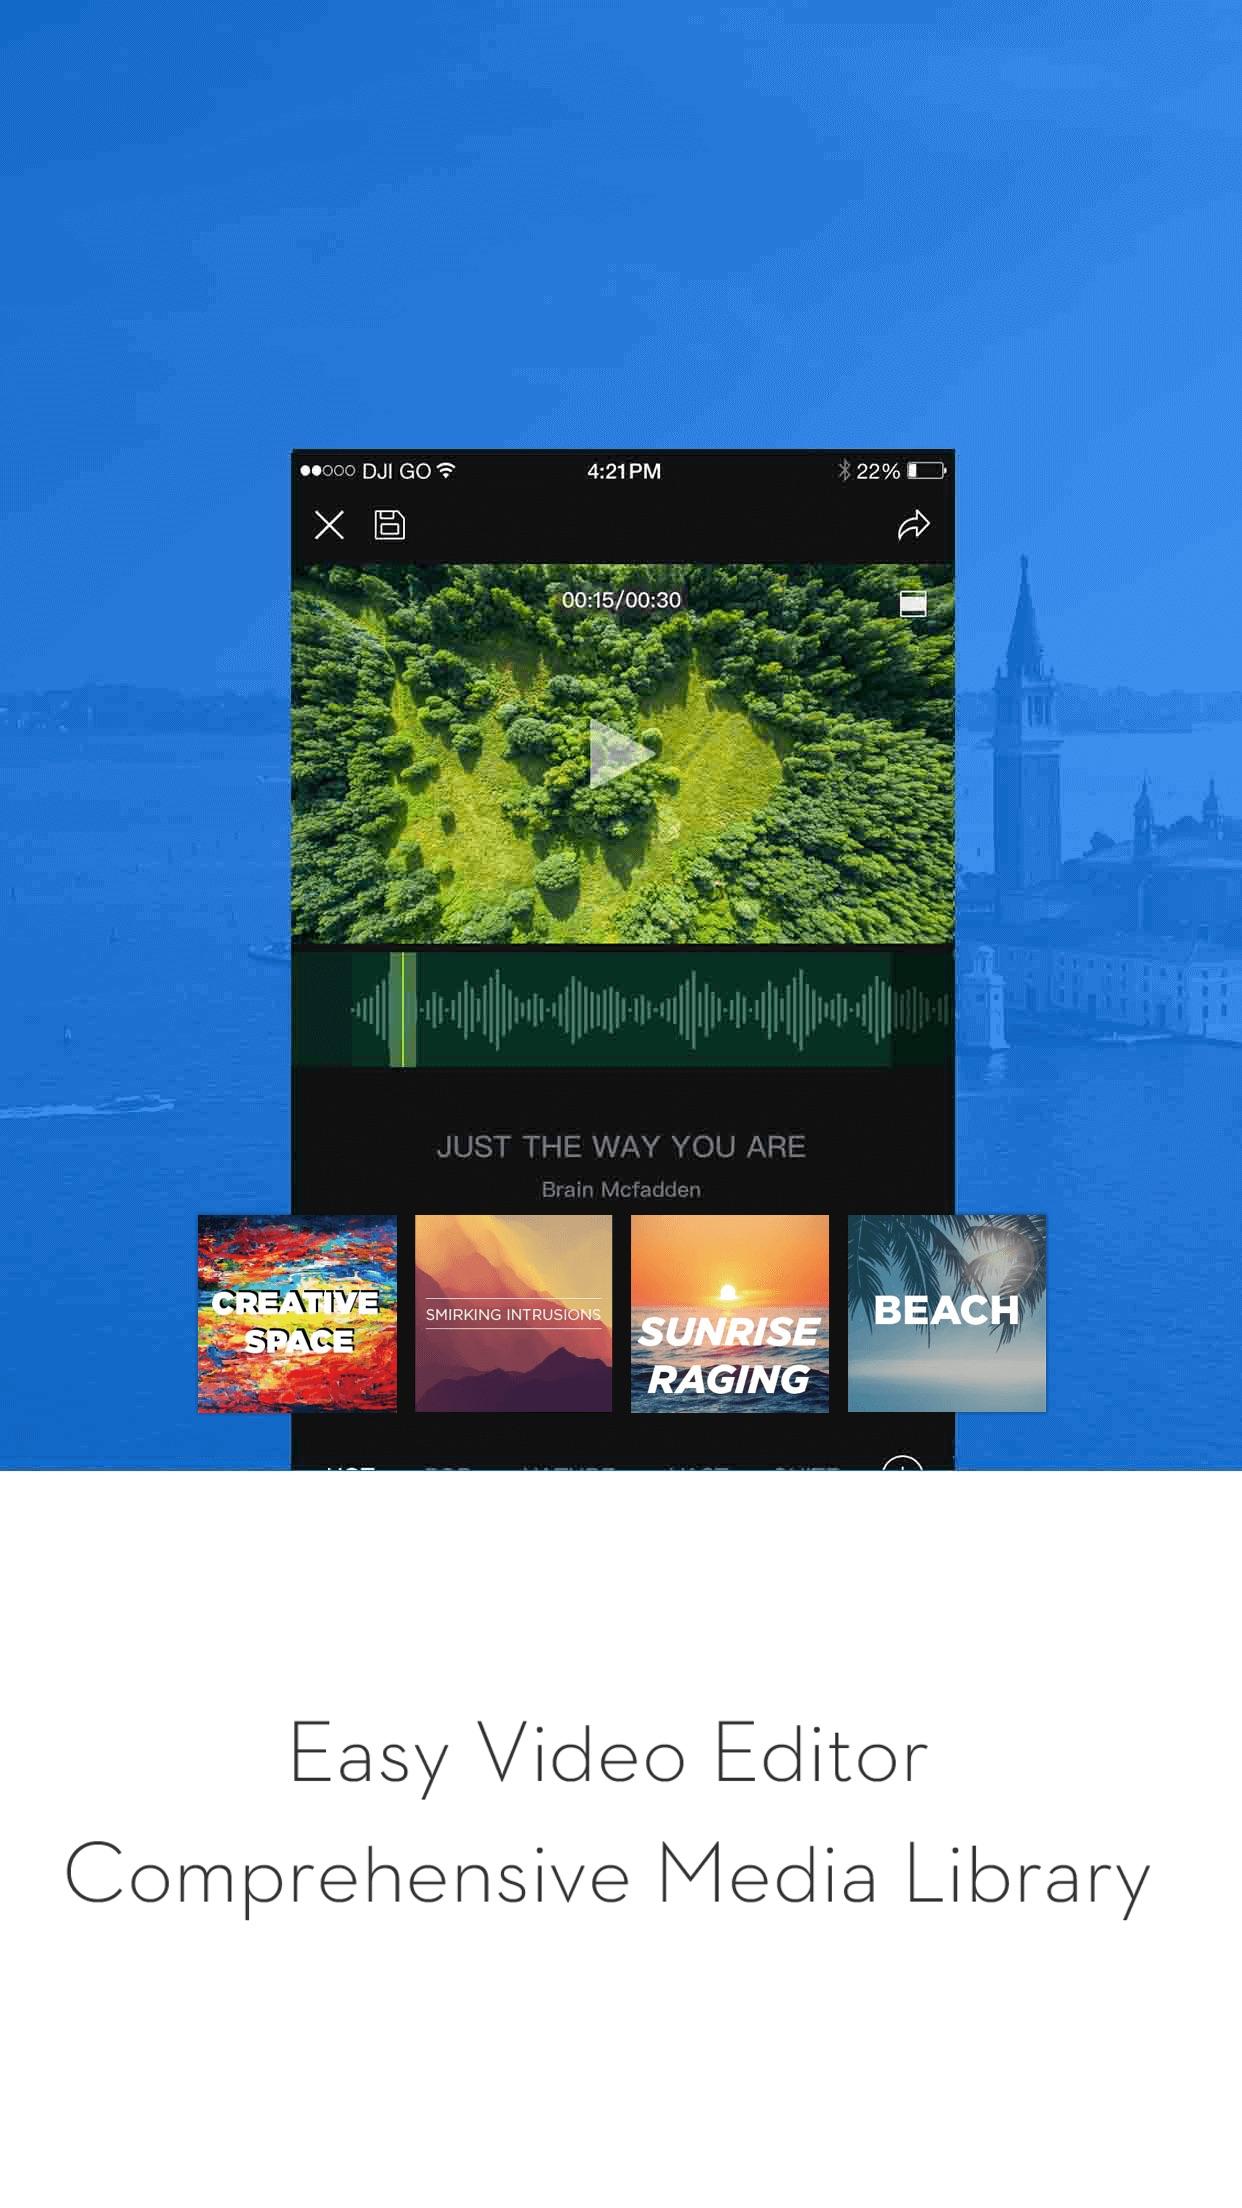 DJI GO - For Phantom 3, Inspire1, OSMO and Matrice Screenshot